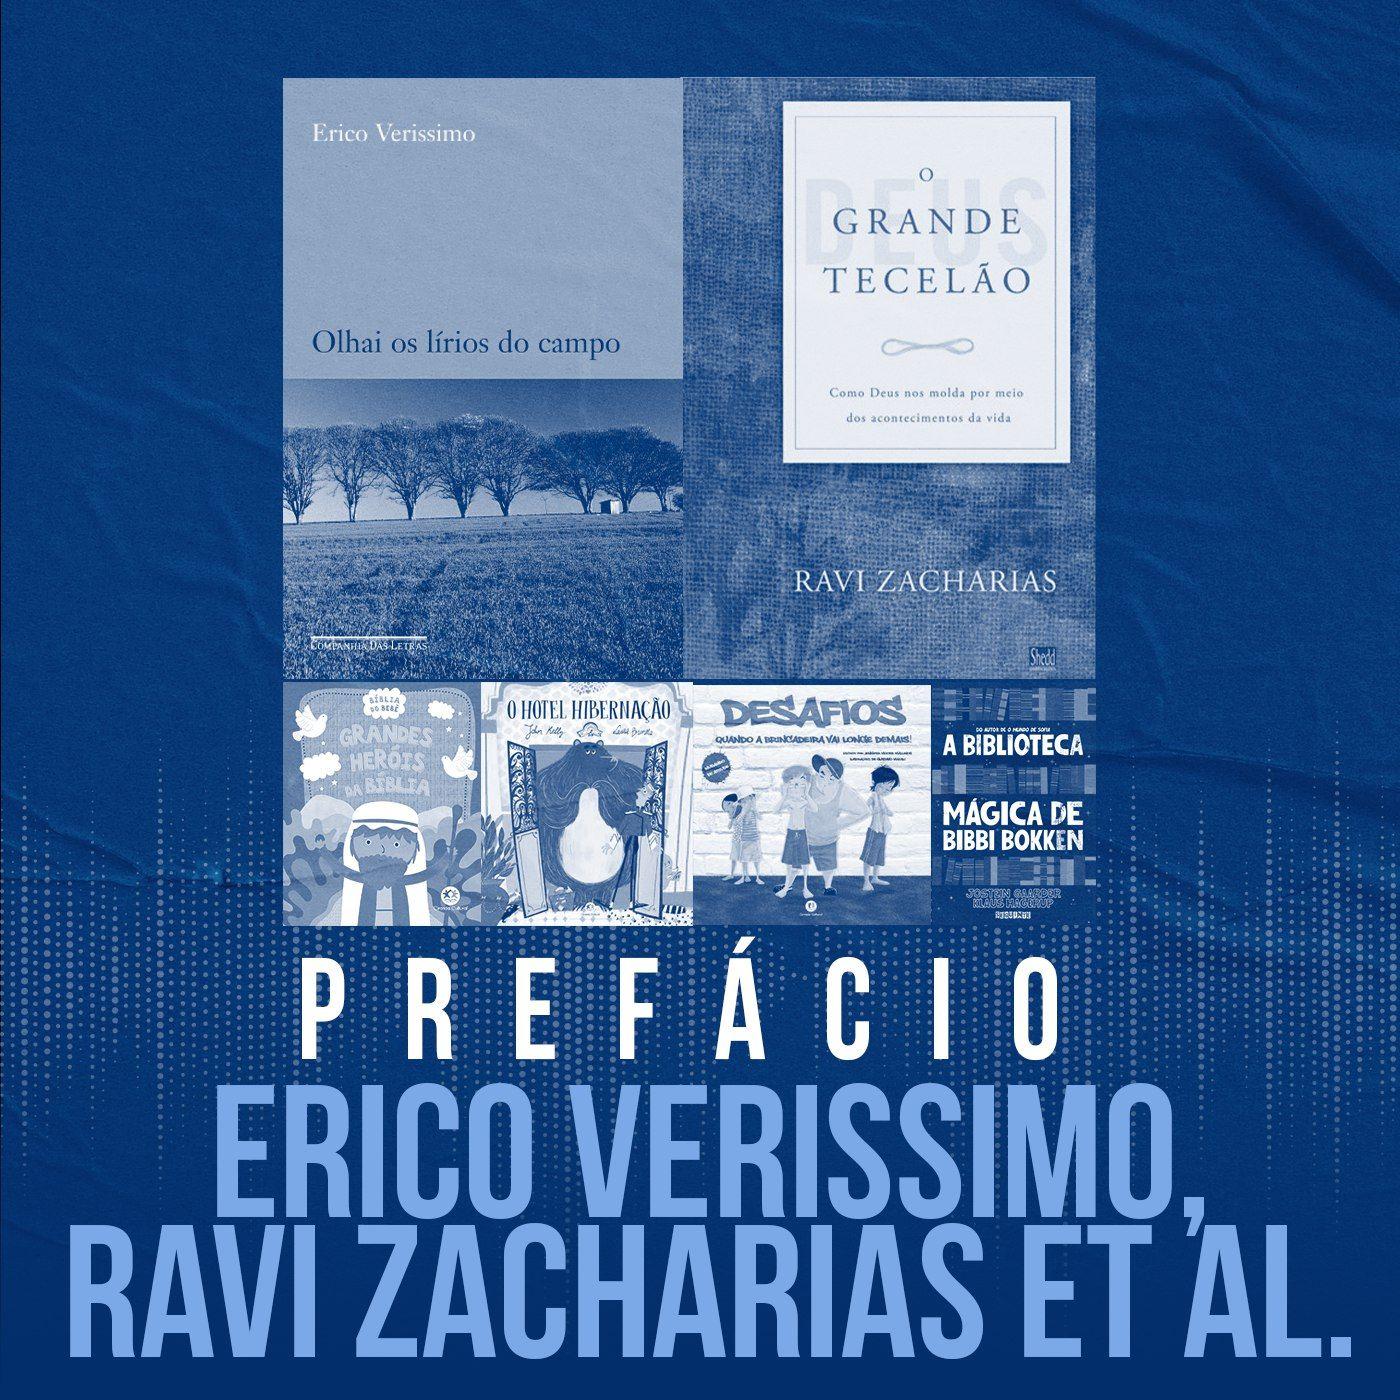 Erico Verissimo; Ravi Zacharias et al. | Prefácio